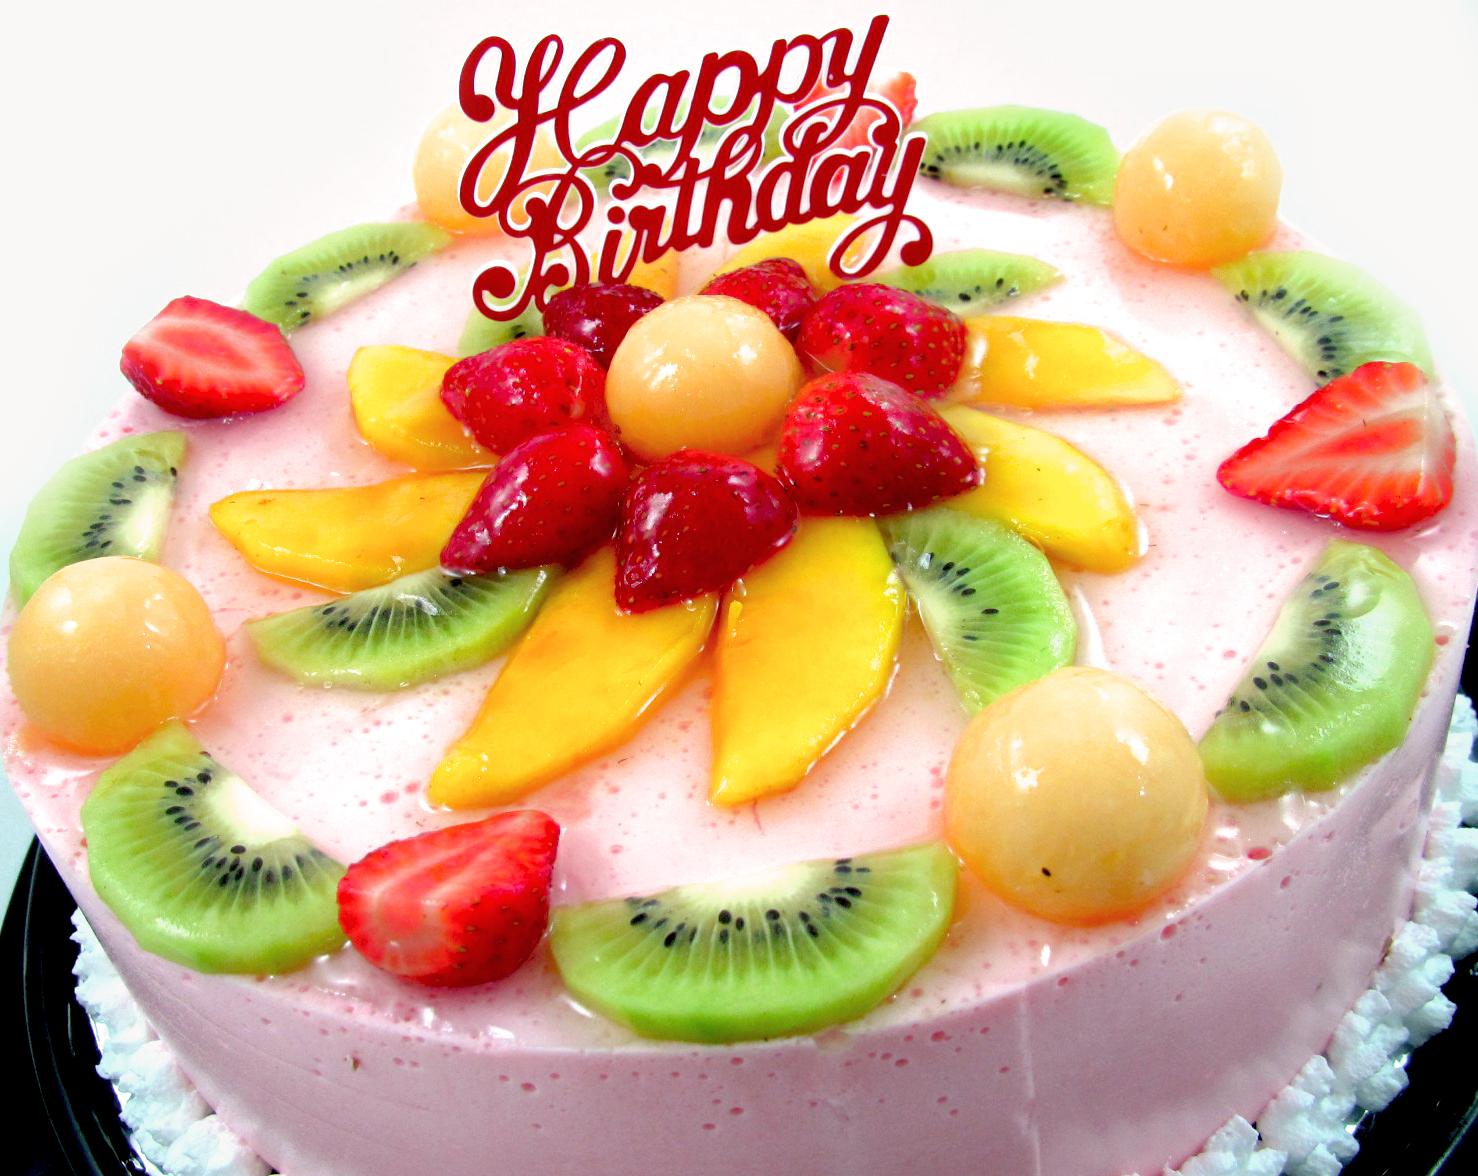 Bake A Wish Pudding Cake